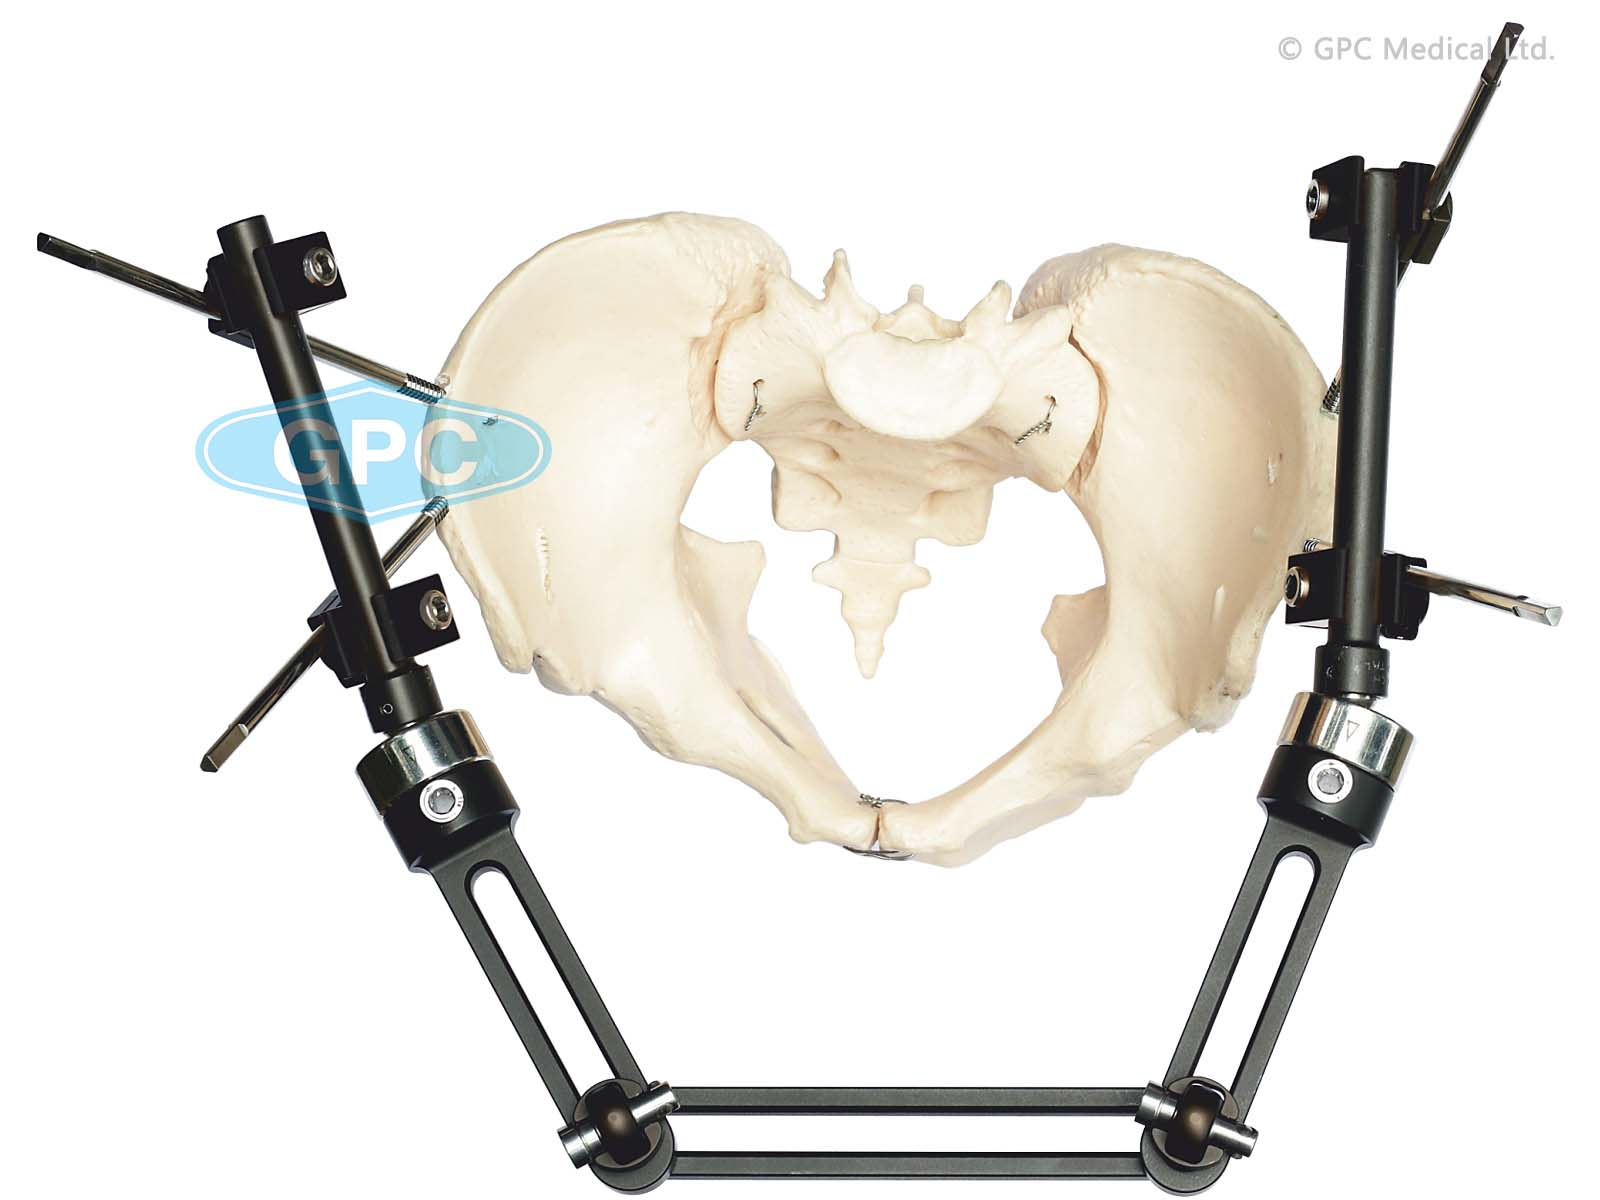 exHEAL Pelvic Fixator System